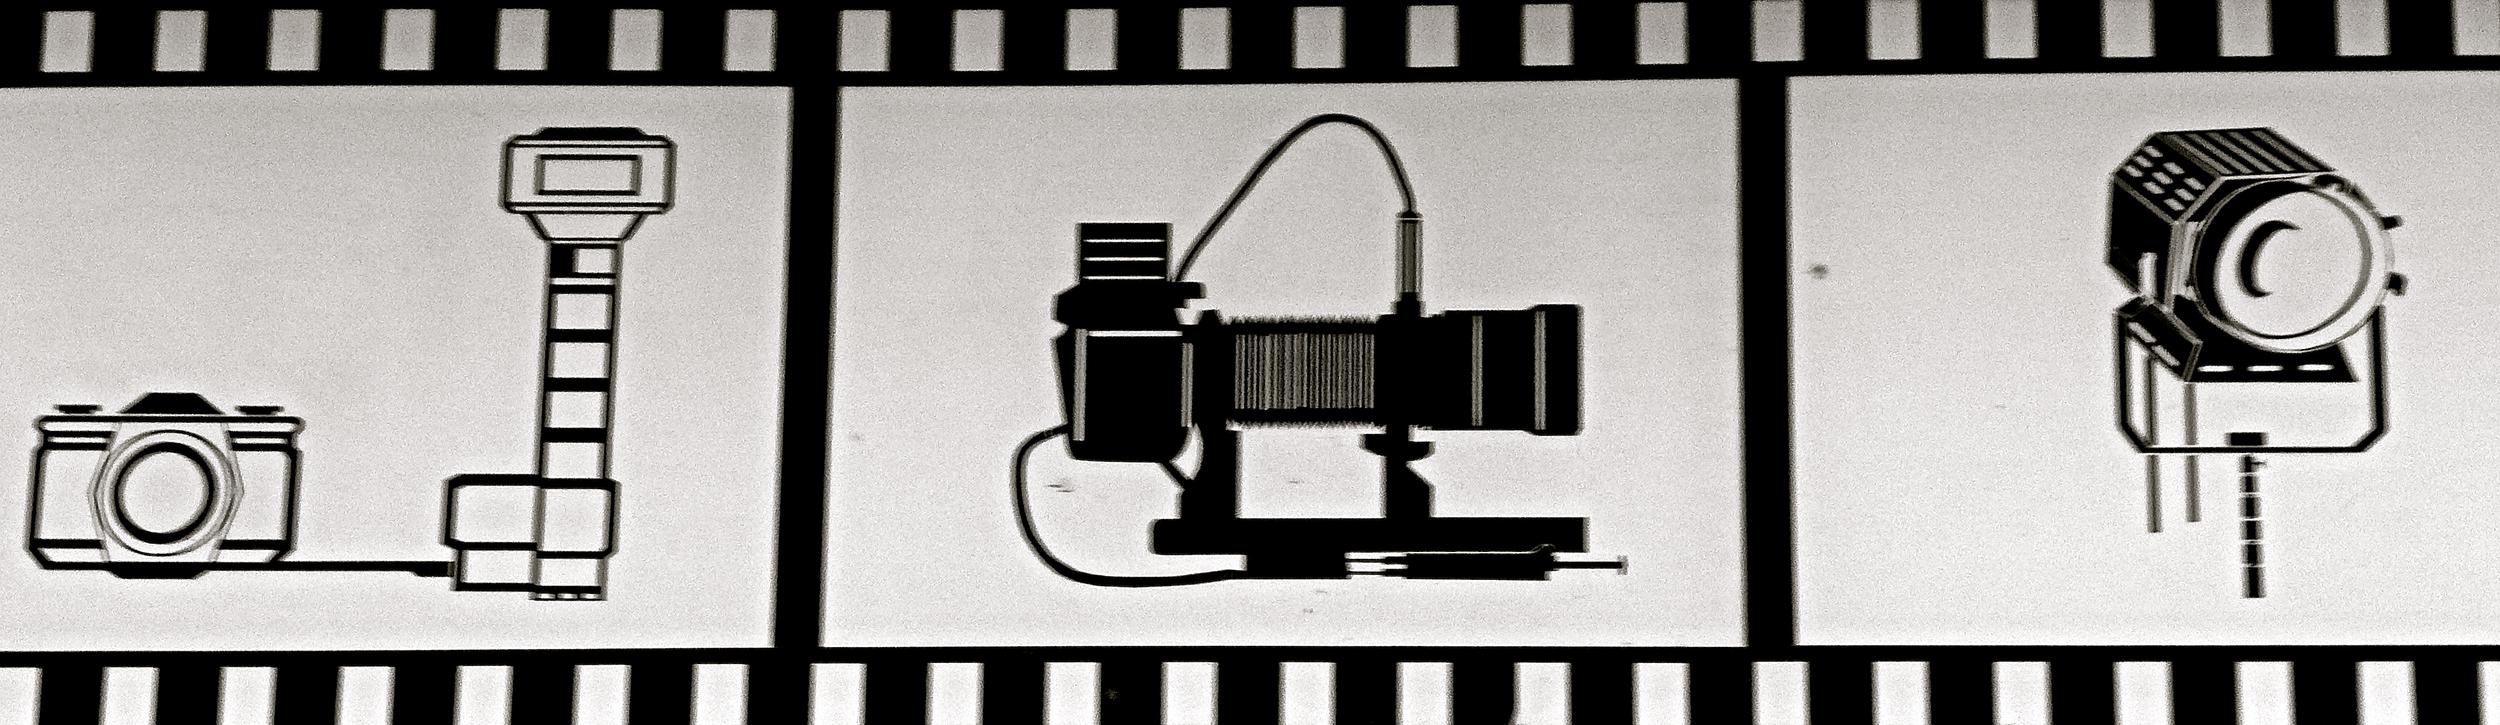 Pictogramas foto